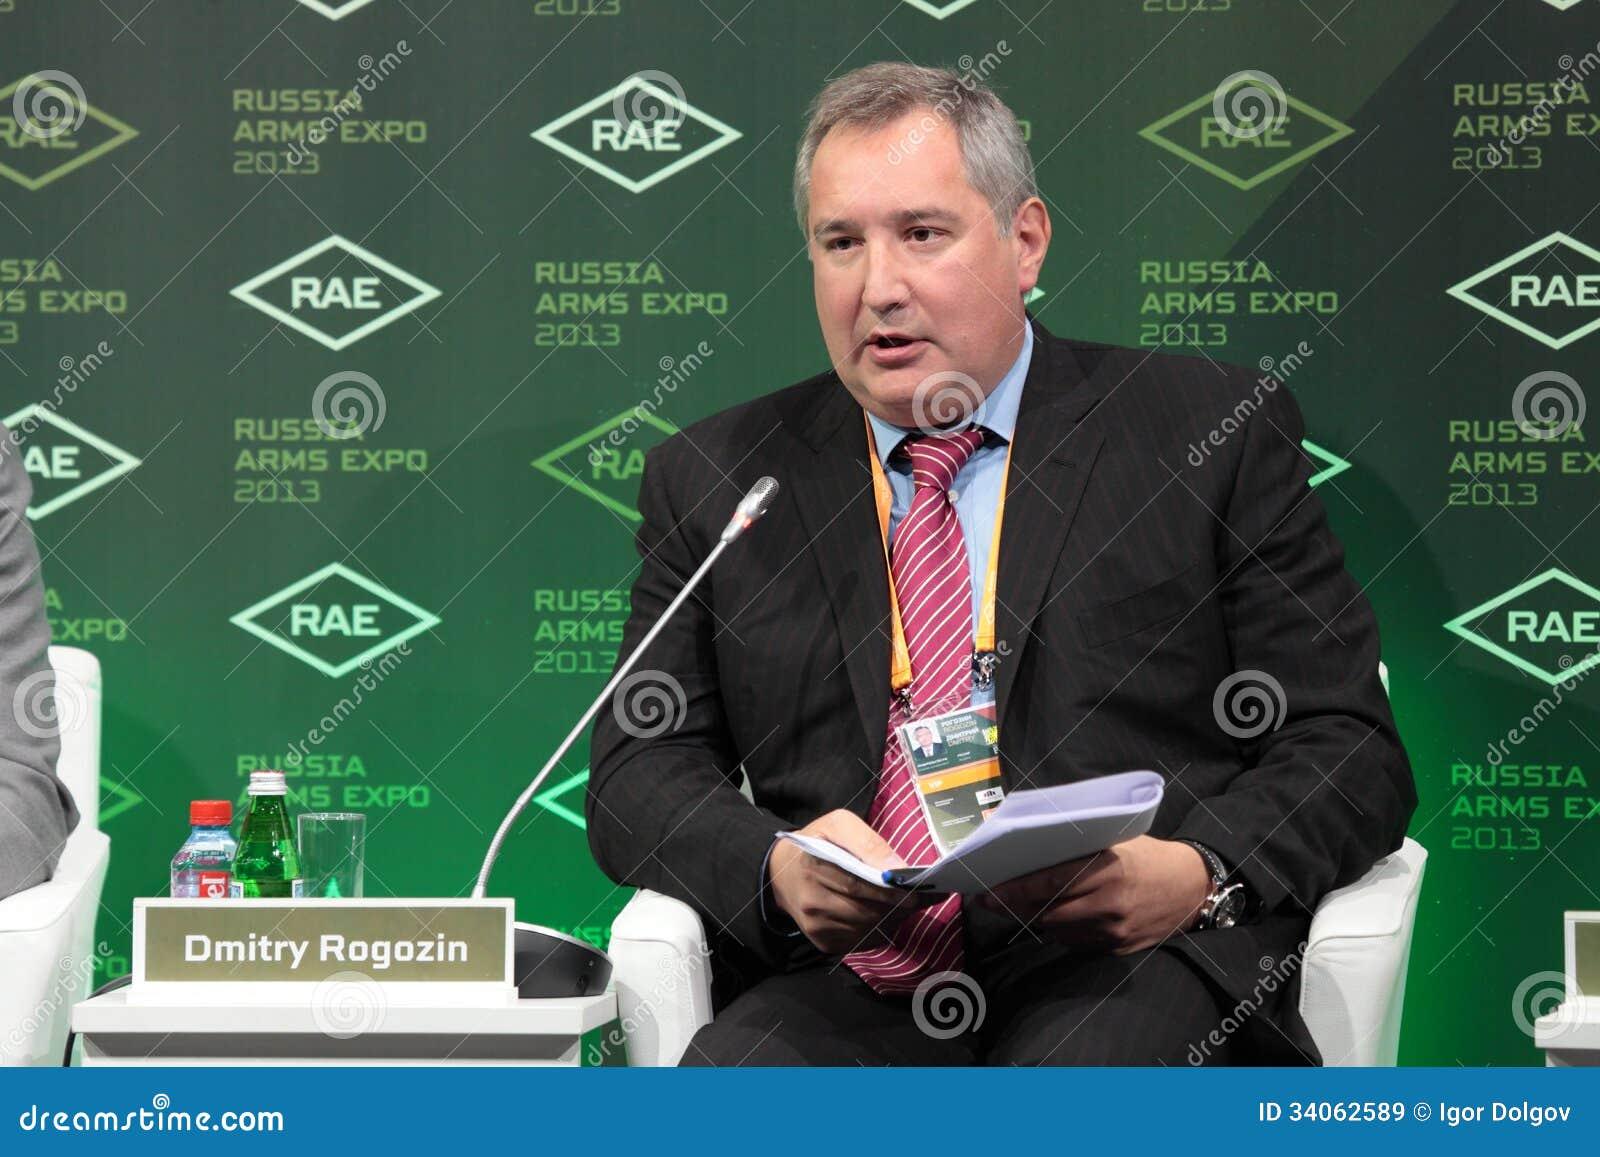 Dmitry Rogozin Editorial Stock Image - Image: 34062589